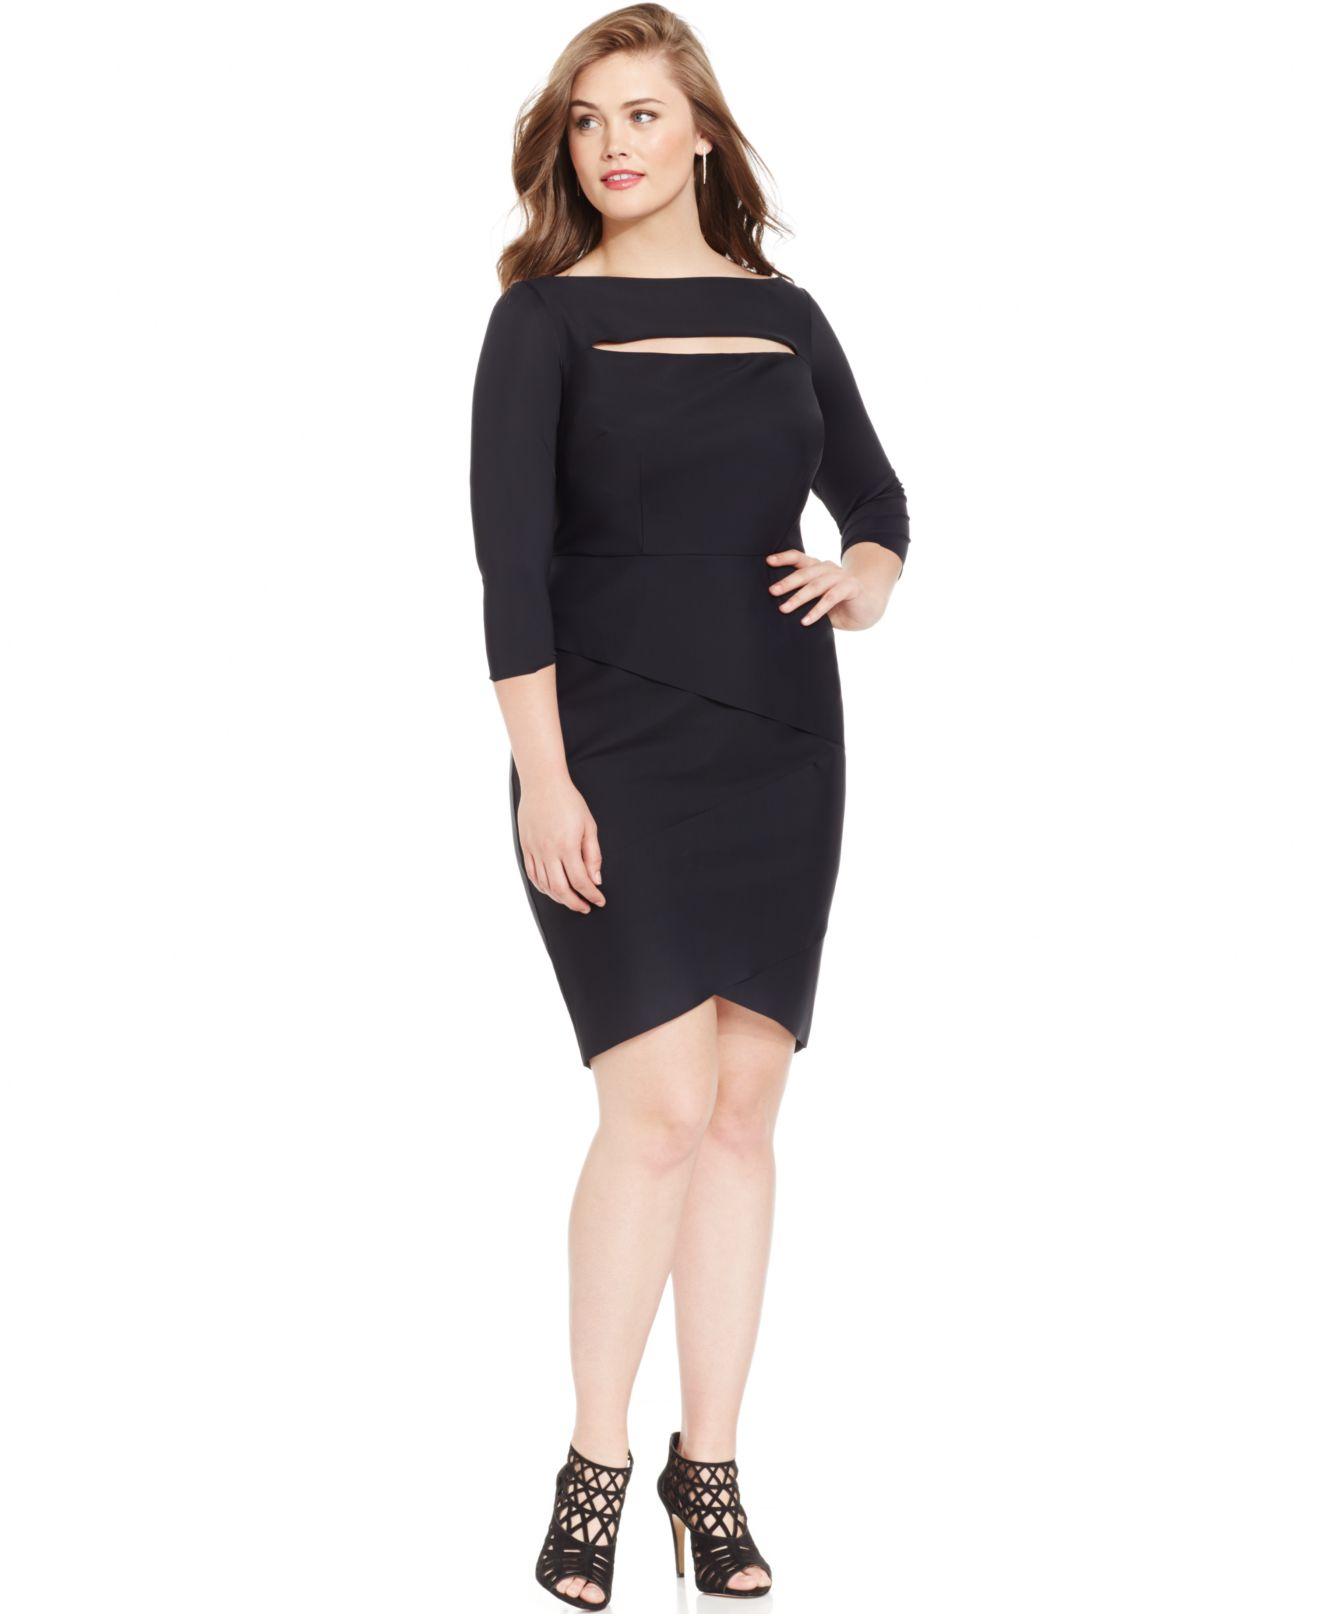 Lyst - Alex evenings Plus Size Tiered Cutout Sheath Dress in Black